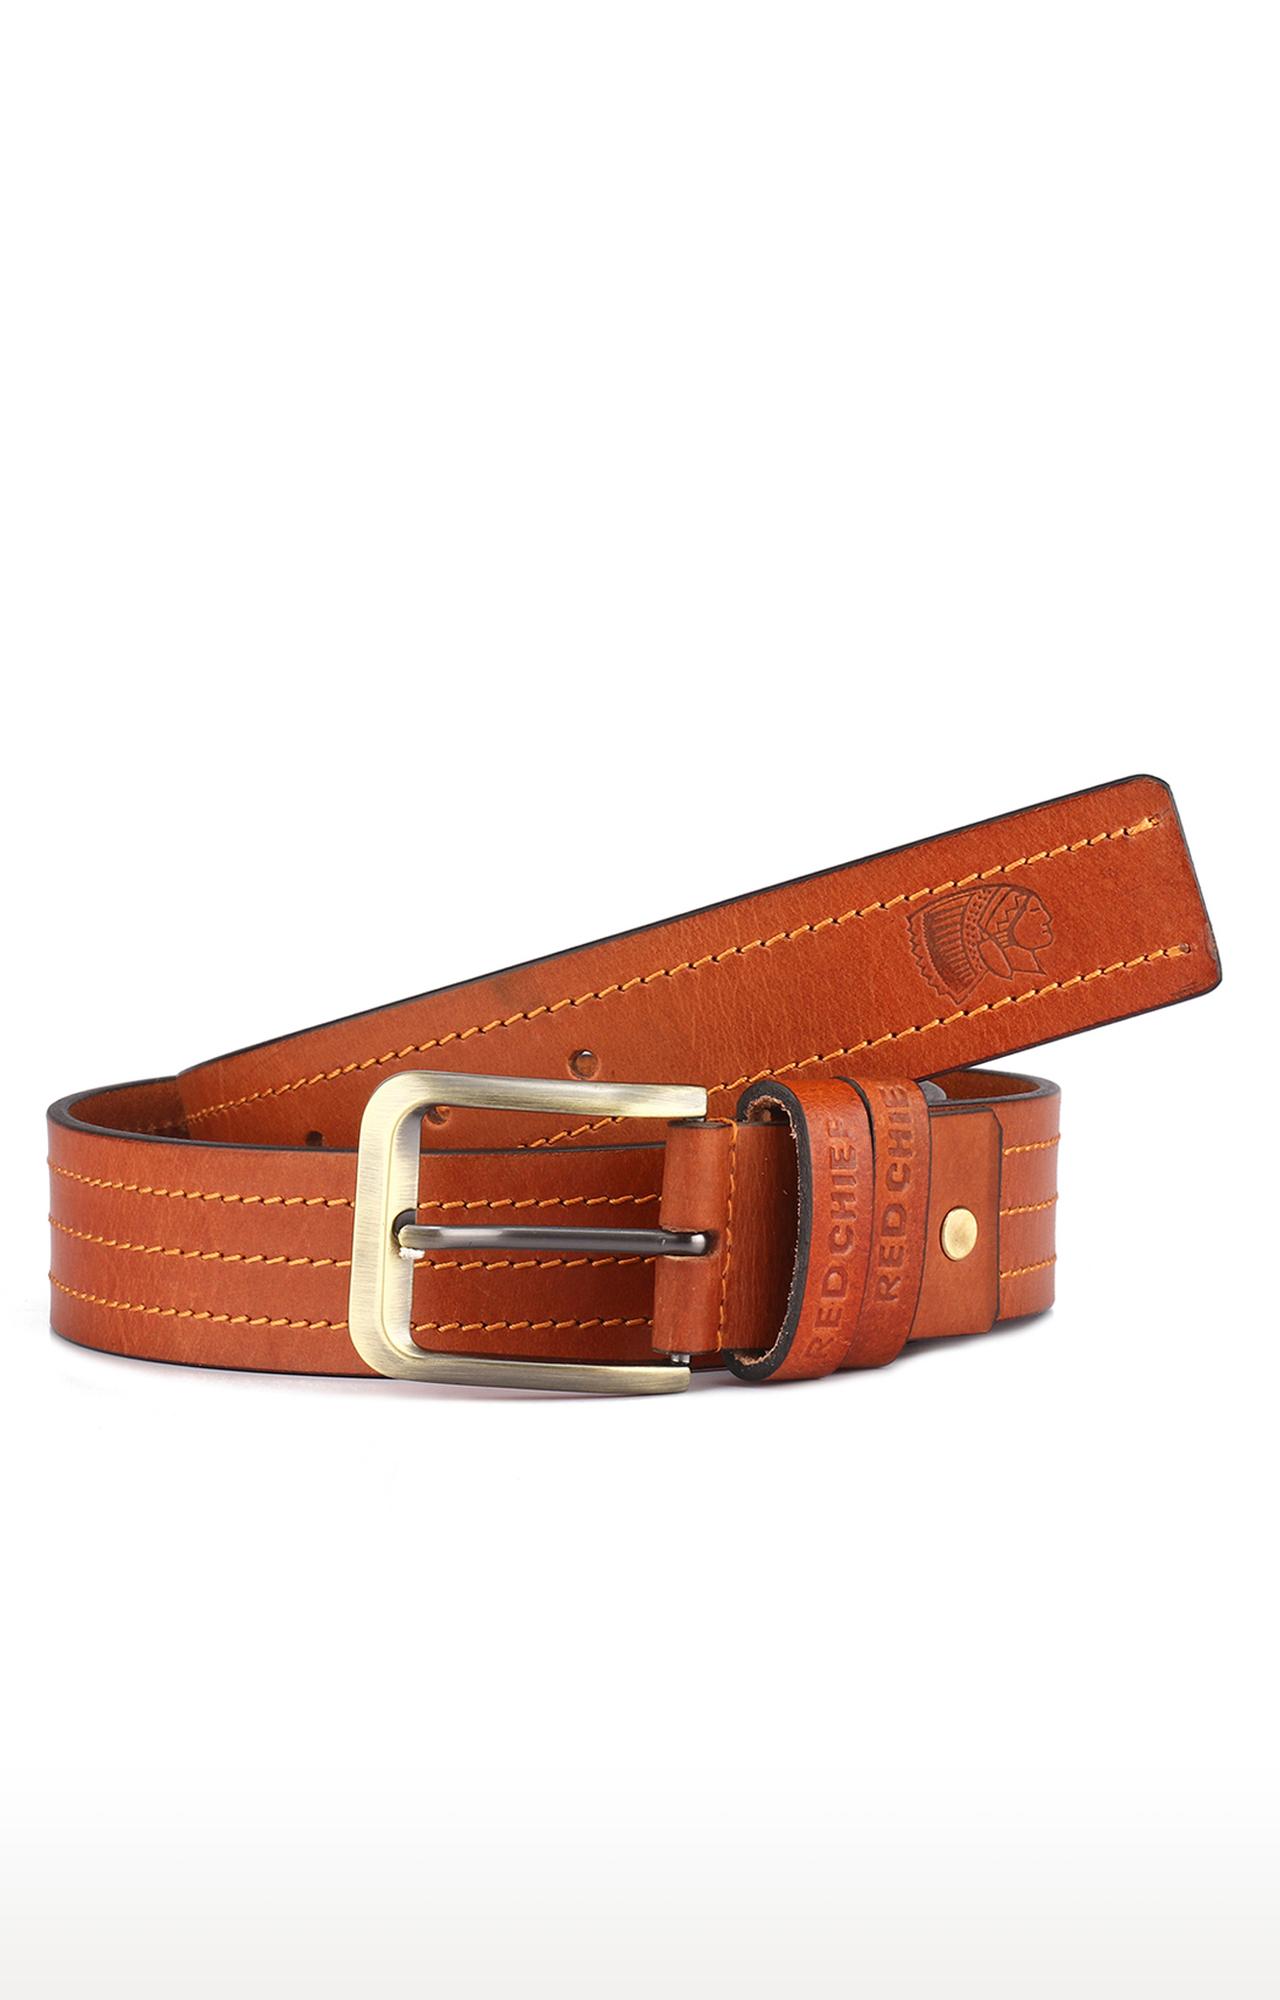 RED CHIEF   Tan Belt